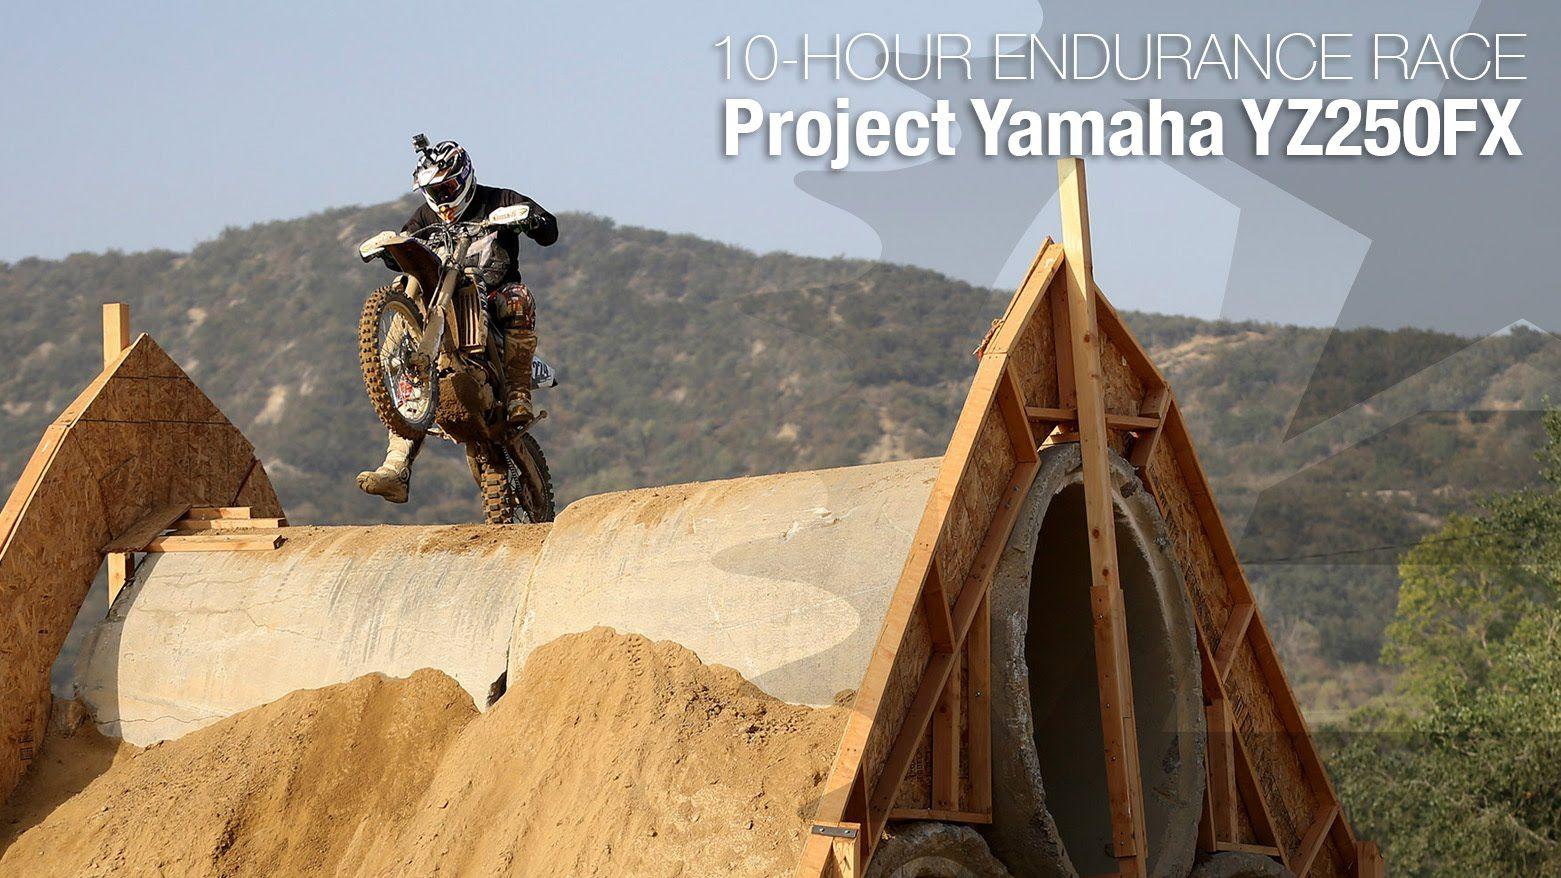 Project 2015 Yamaha YZ250FX at the JBC 10-Hour Endurance Race - MotoUSA